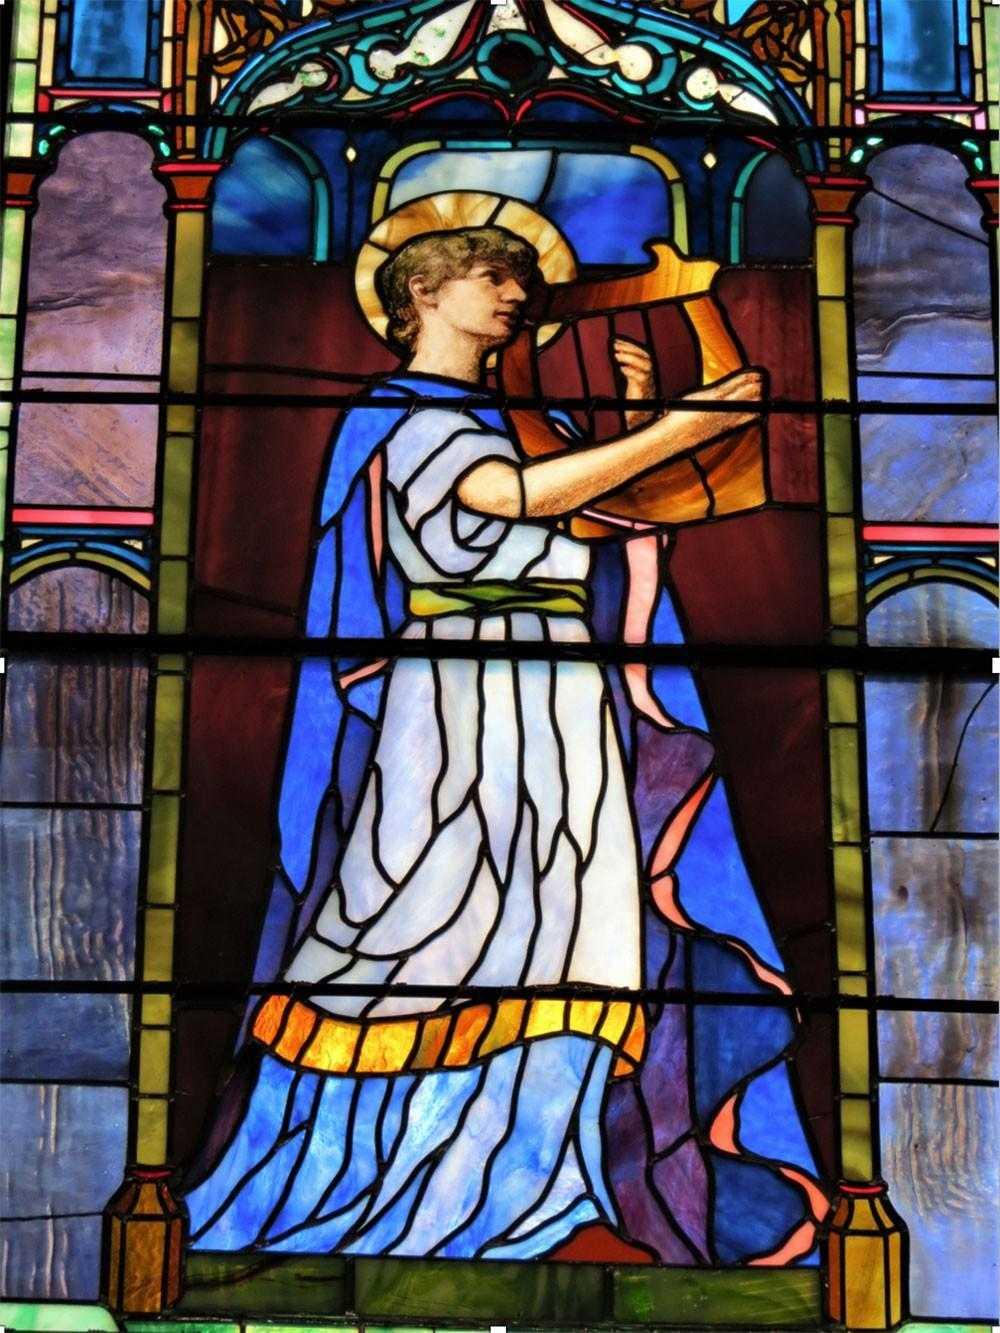 LeFarge stained glass window restoration